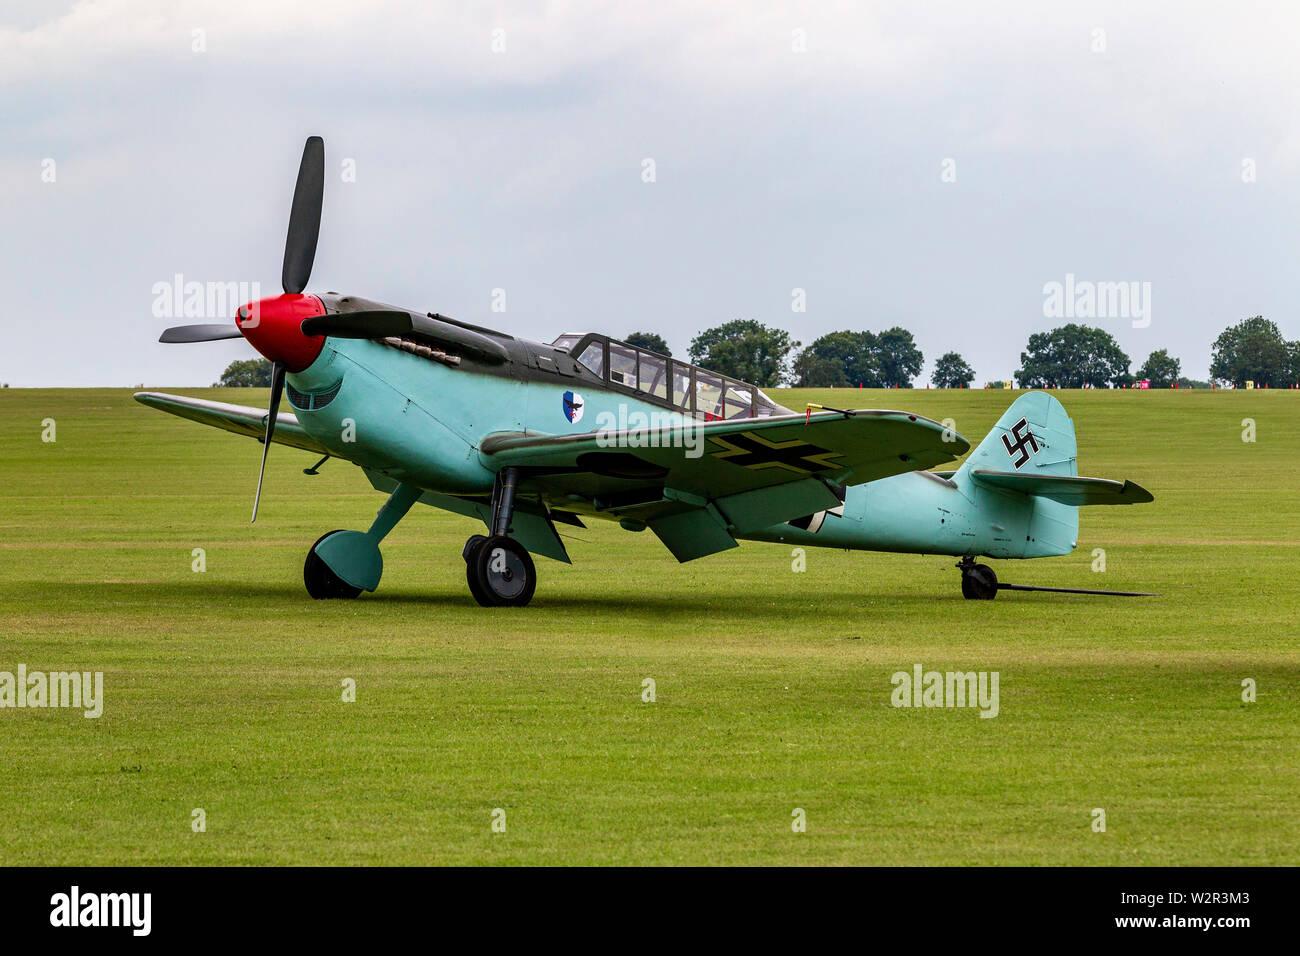 Messerschmitt on the ground at Sywell  Aerodrome, Northamptonshire, UK. - Stock Image